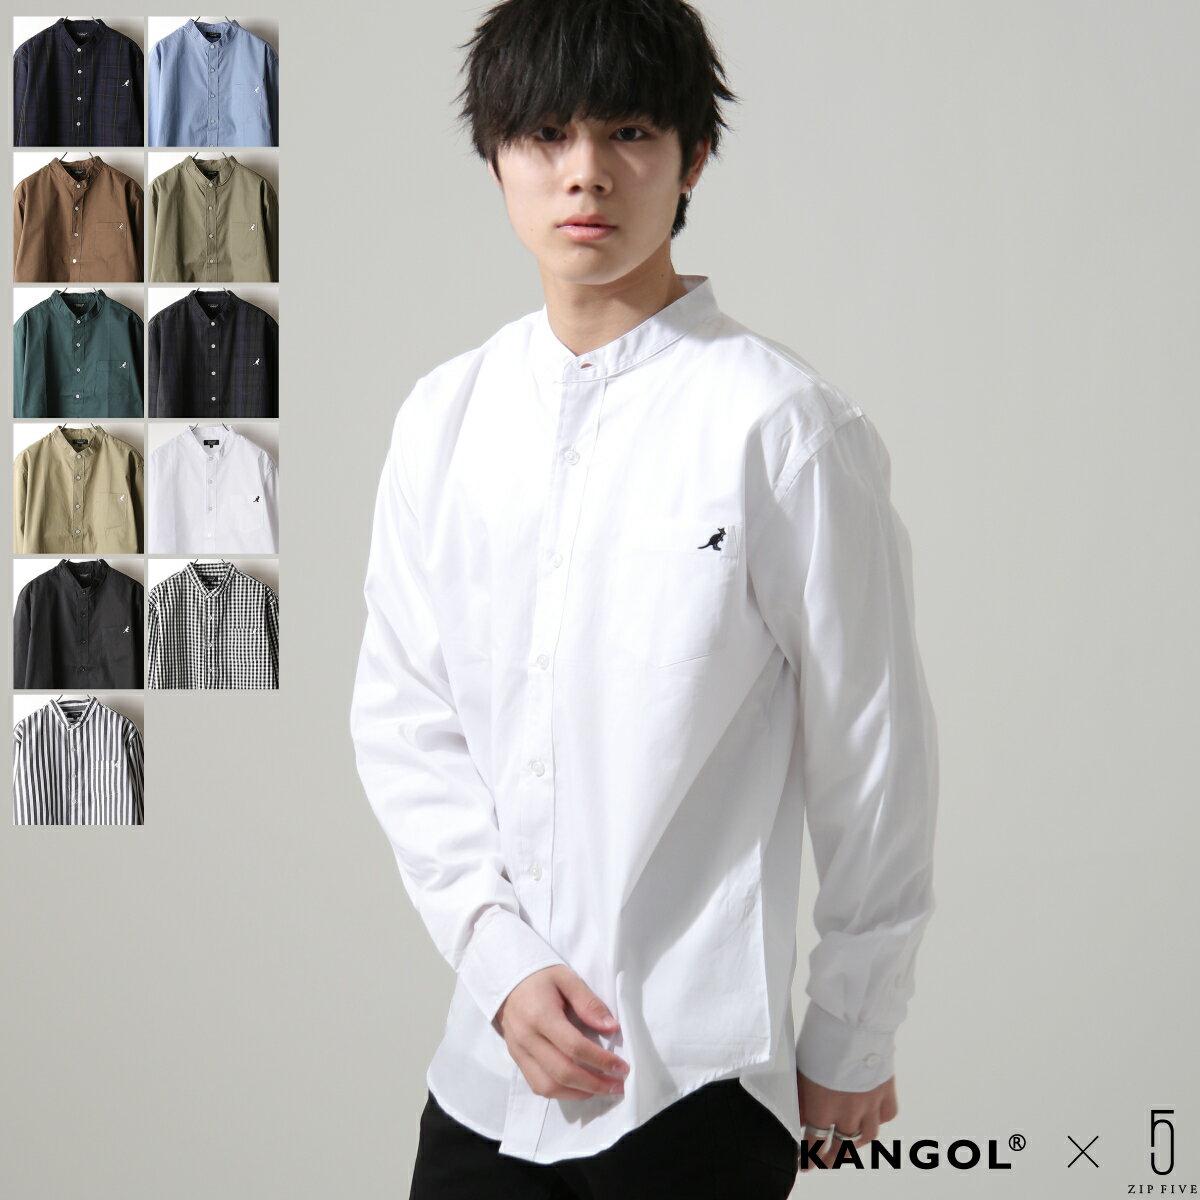 【New】KANGOL 立領襯衫 特注款 0